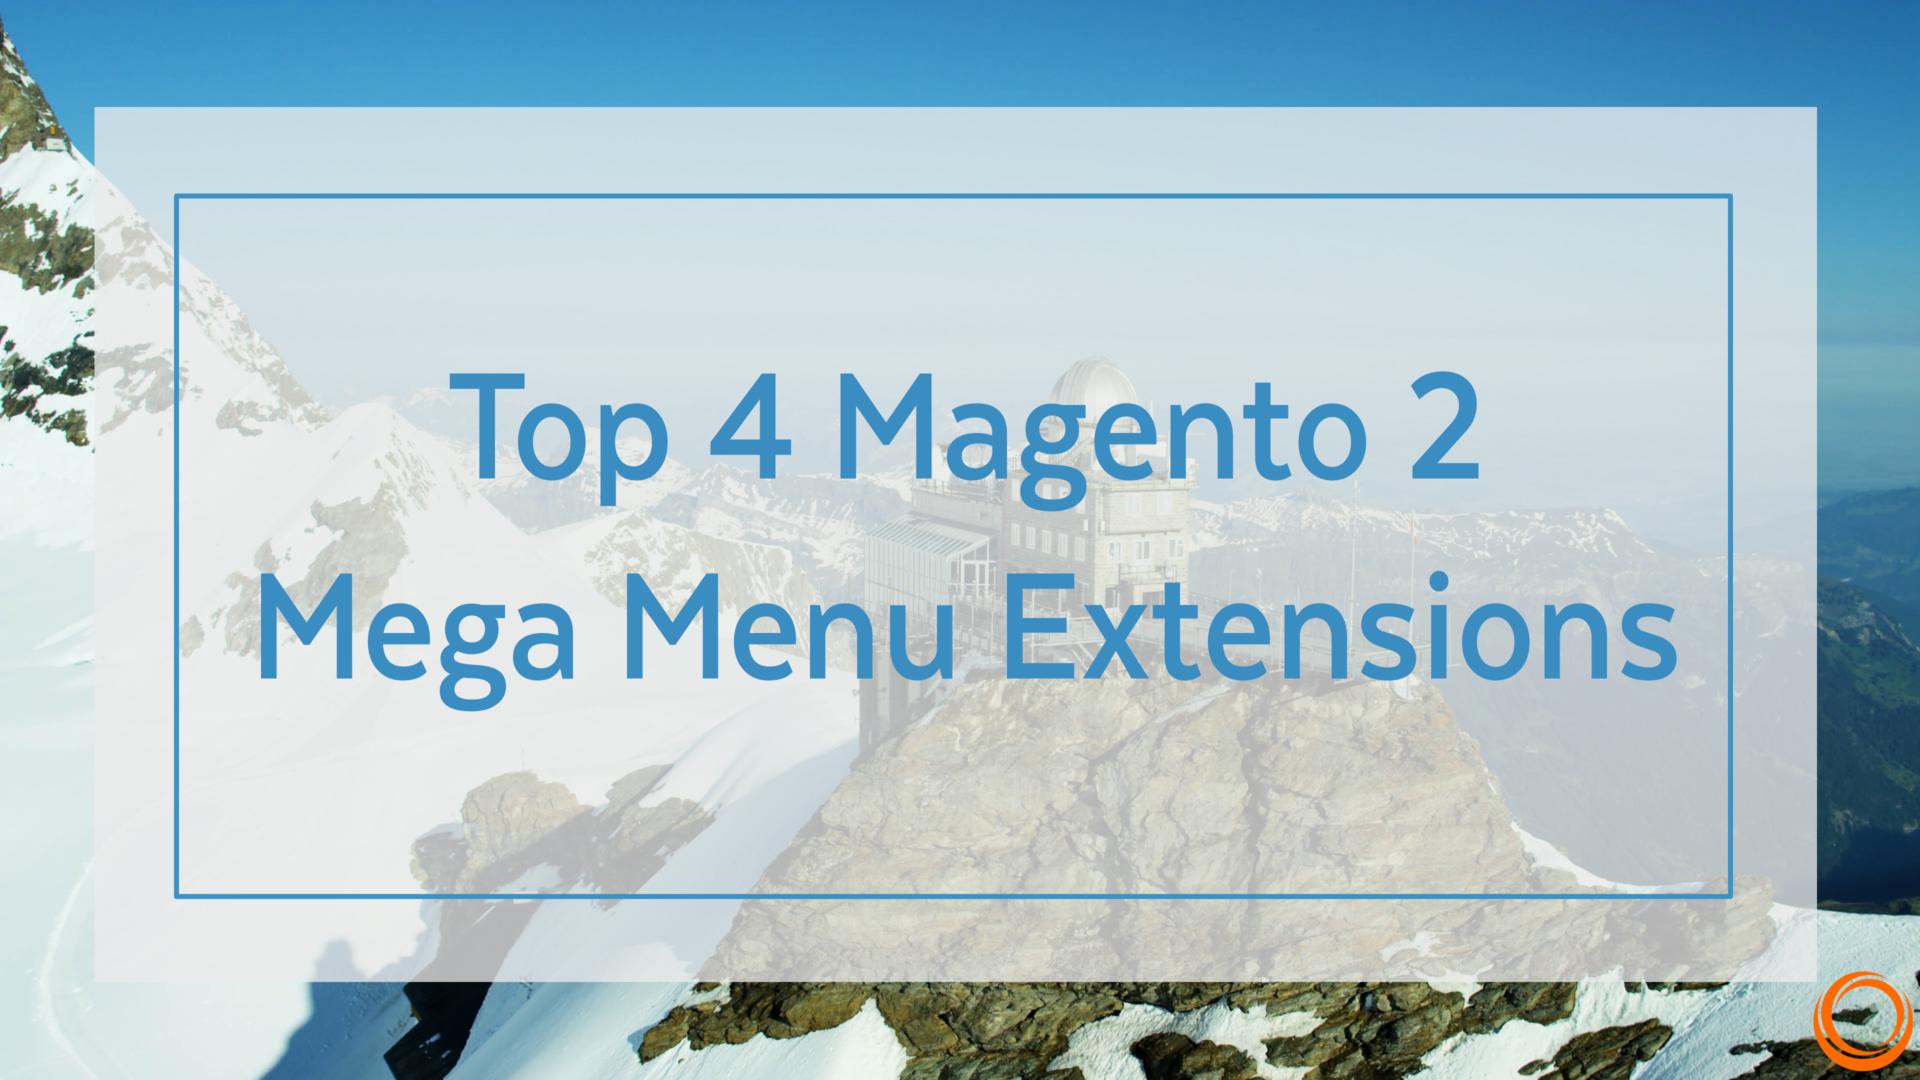 Top 4 Magento 2 menu